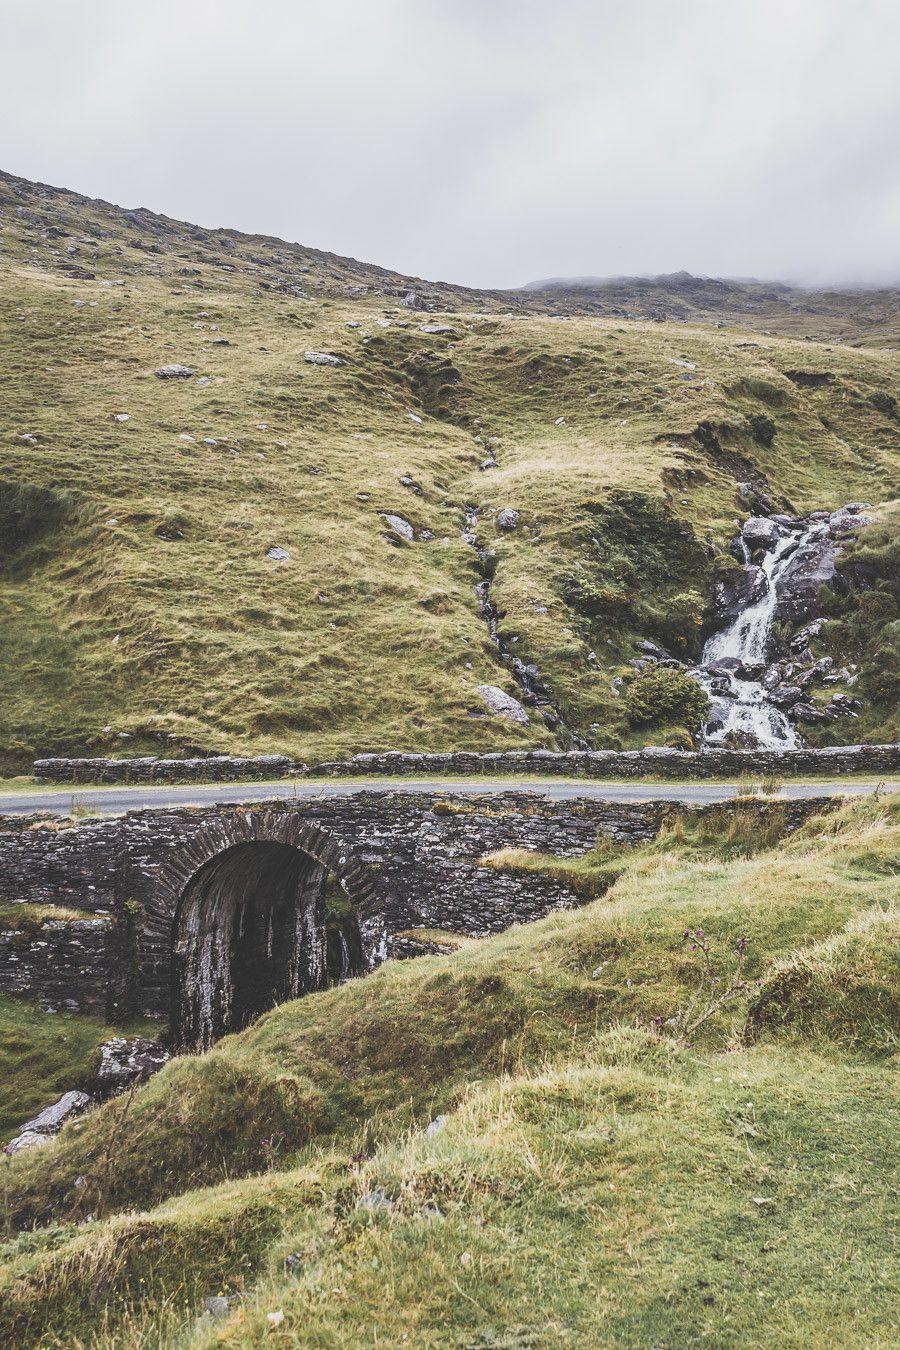 Les routes sinueuses en Irlande